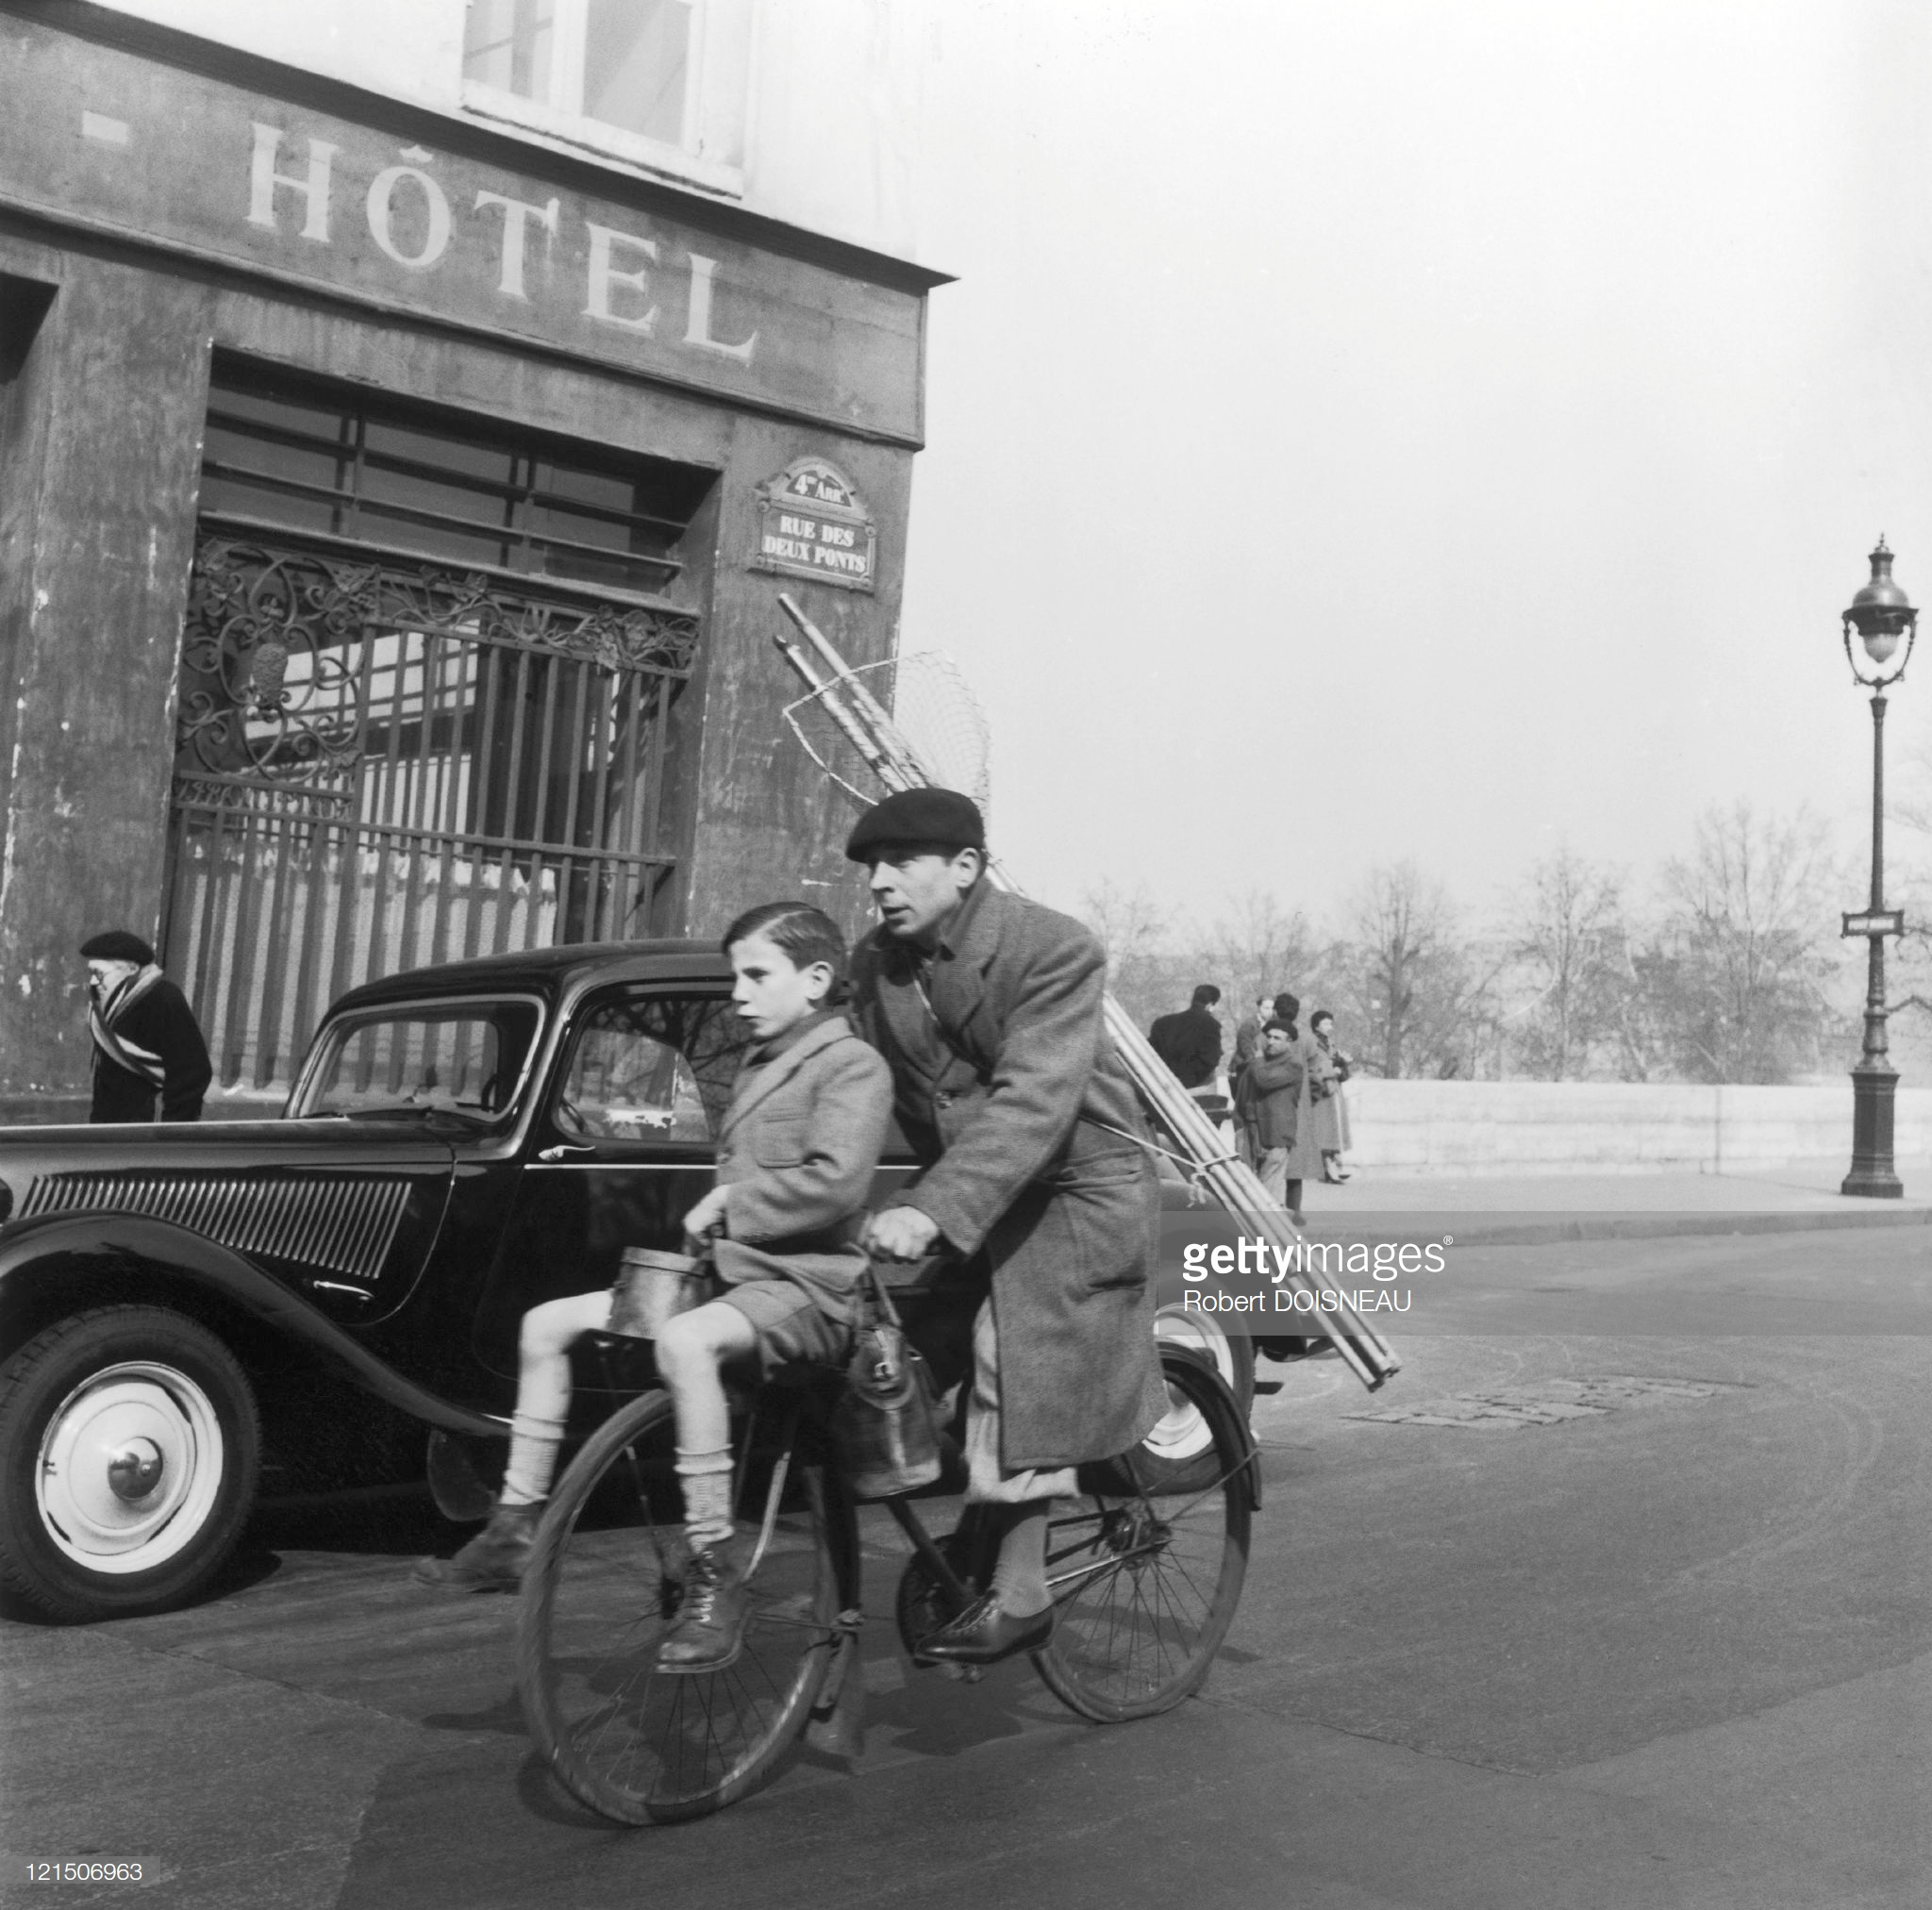 Париж во время праздников